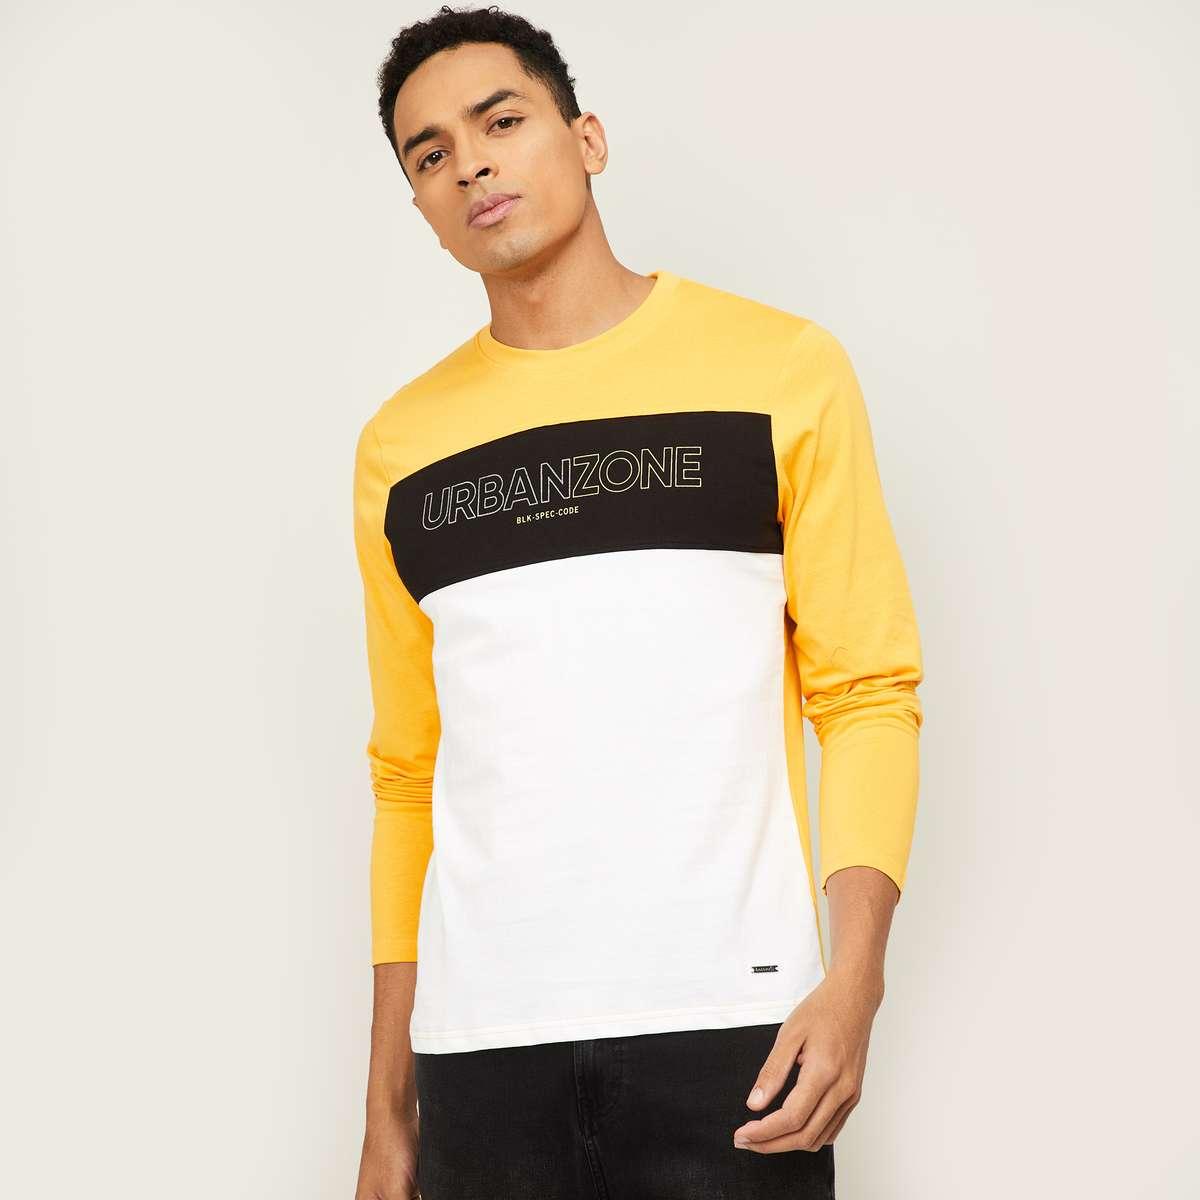 5.BOSSINI Men Colourblocked Crew Neck T-Shirt